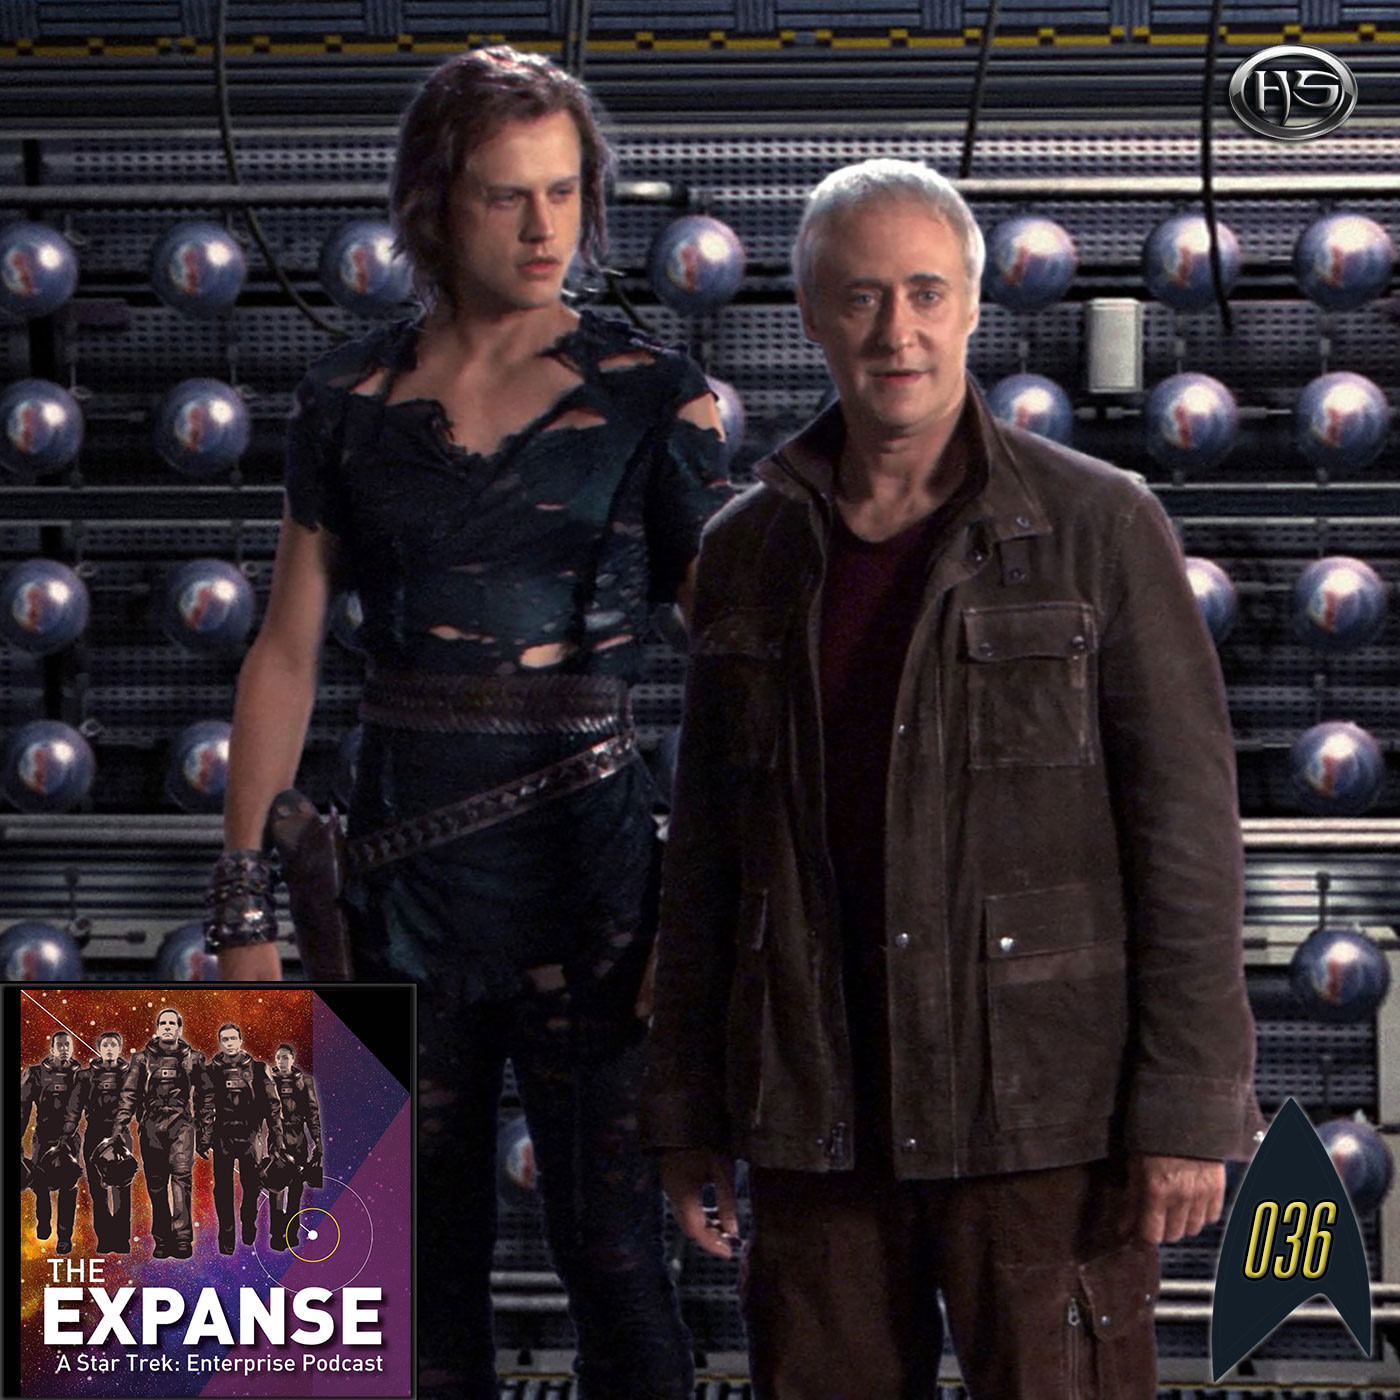 The Expanse Episode 36